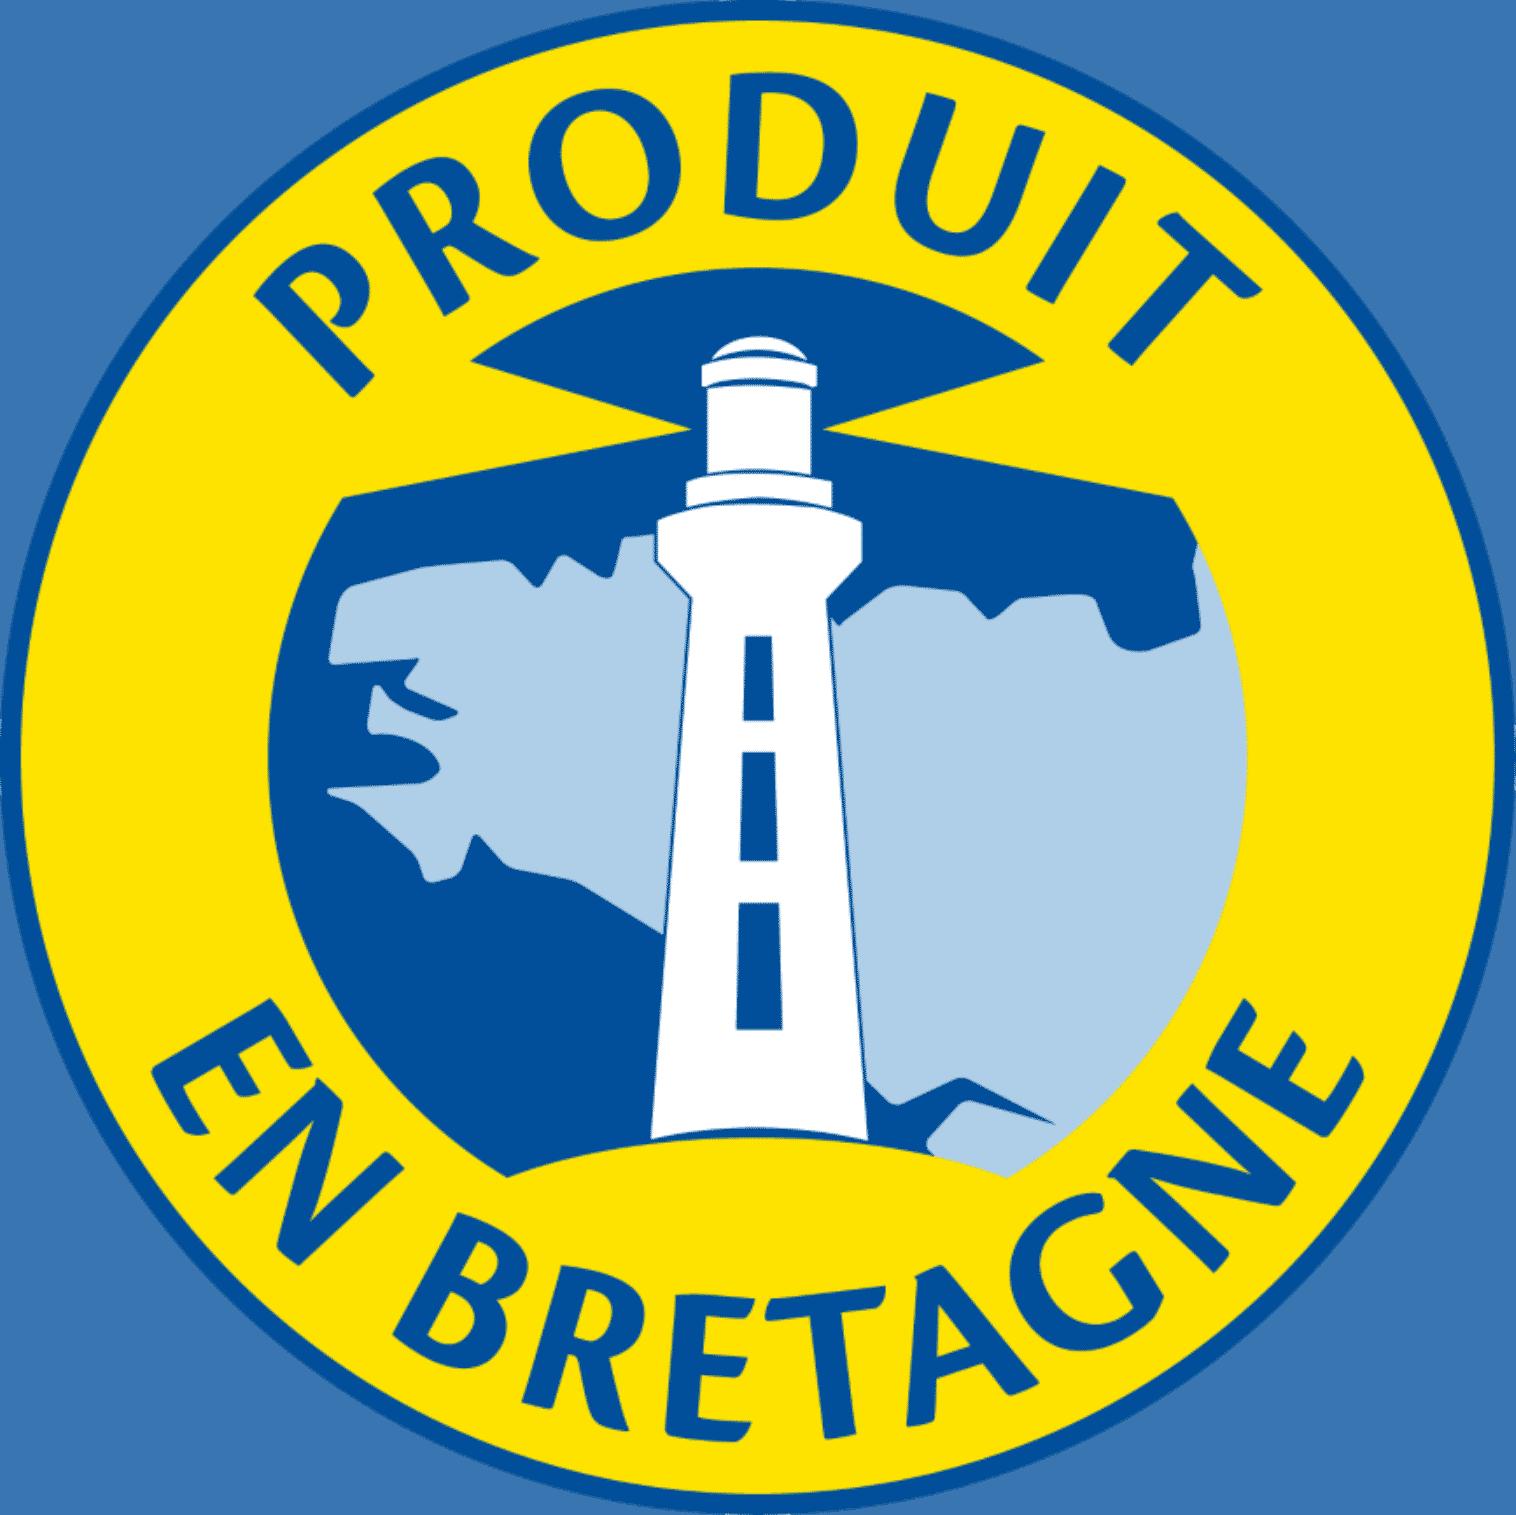 Icone Produits en Bretagne